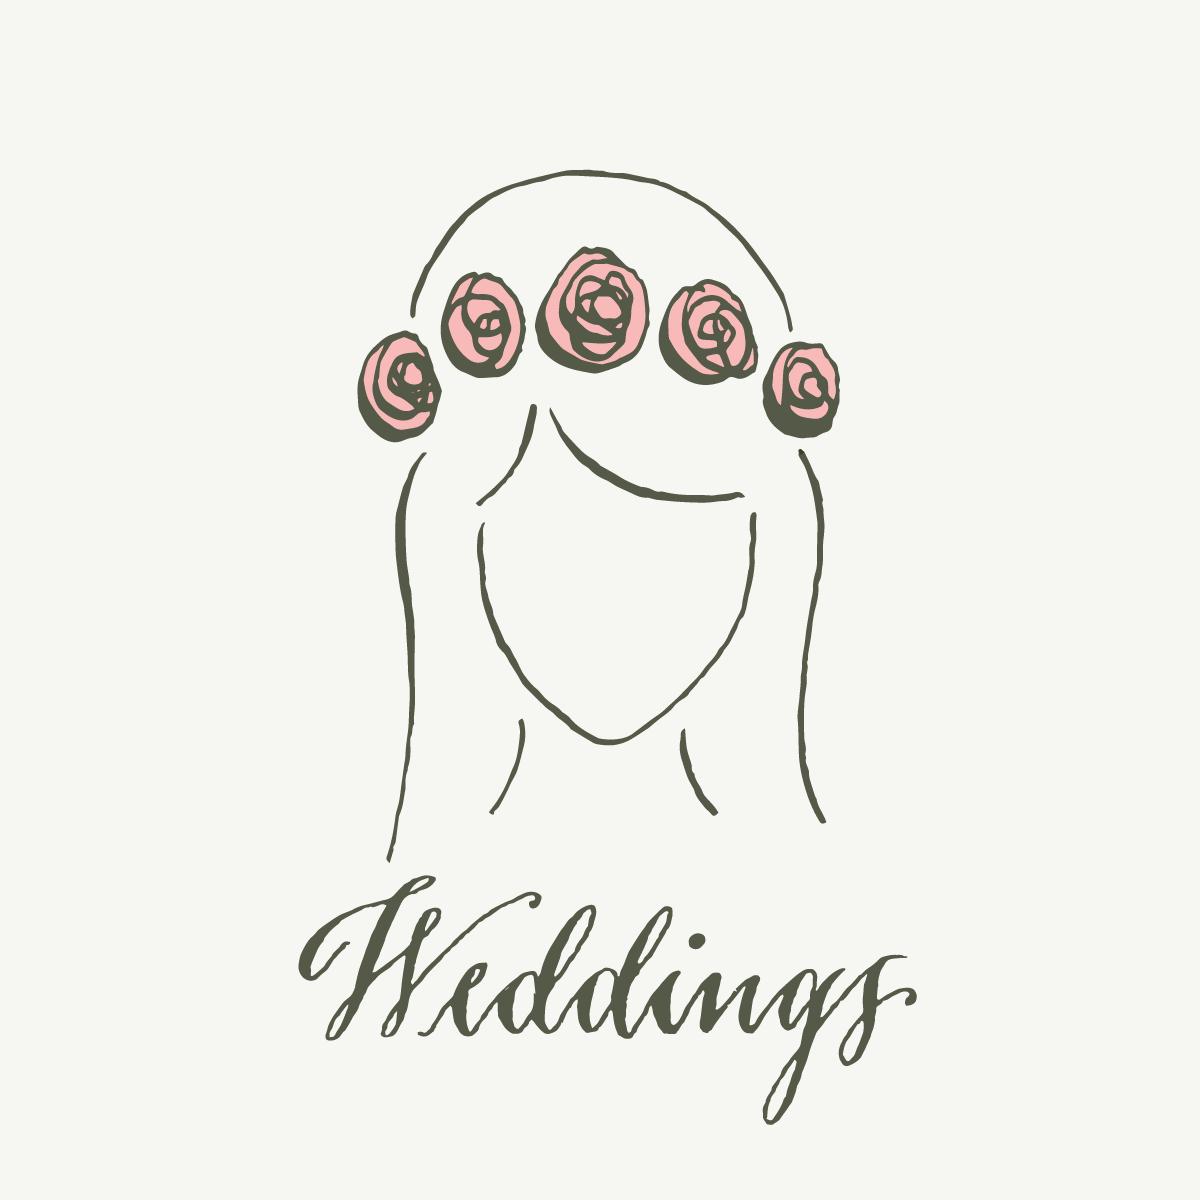 Mrs_Calabash_Bride_Square.png